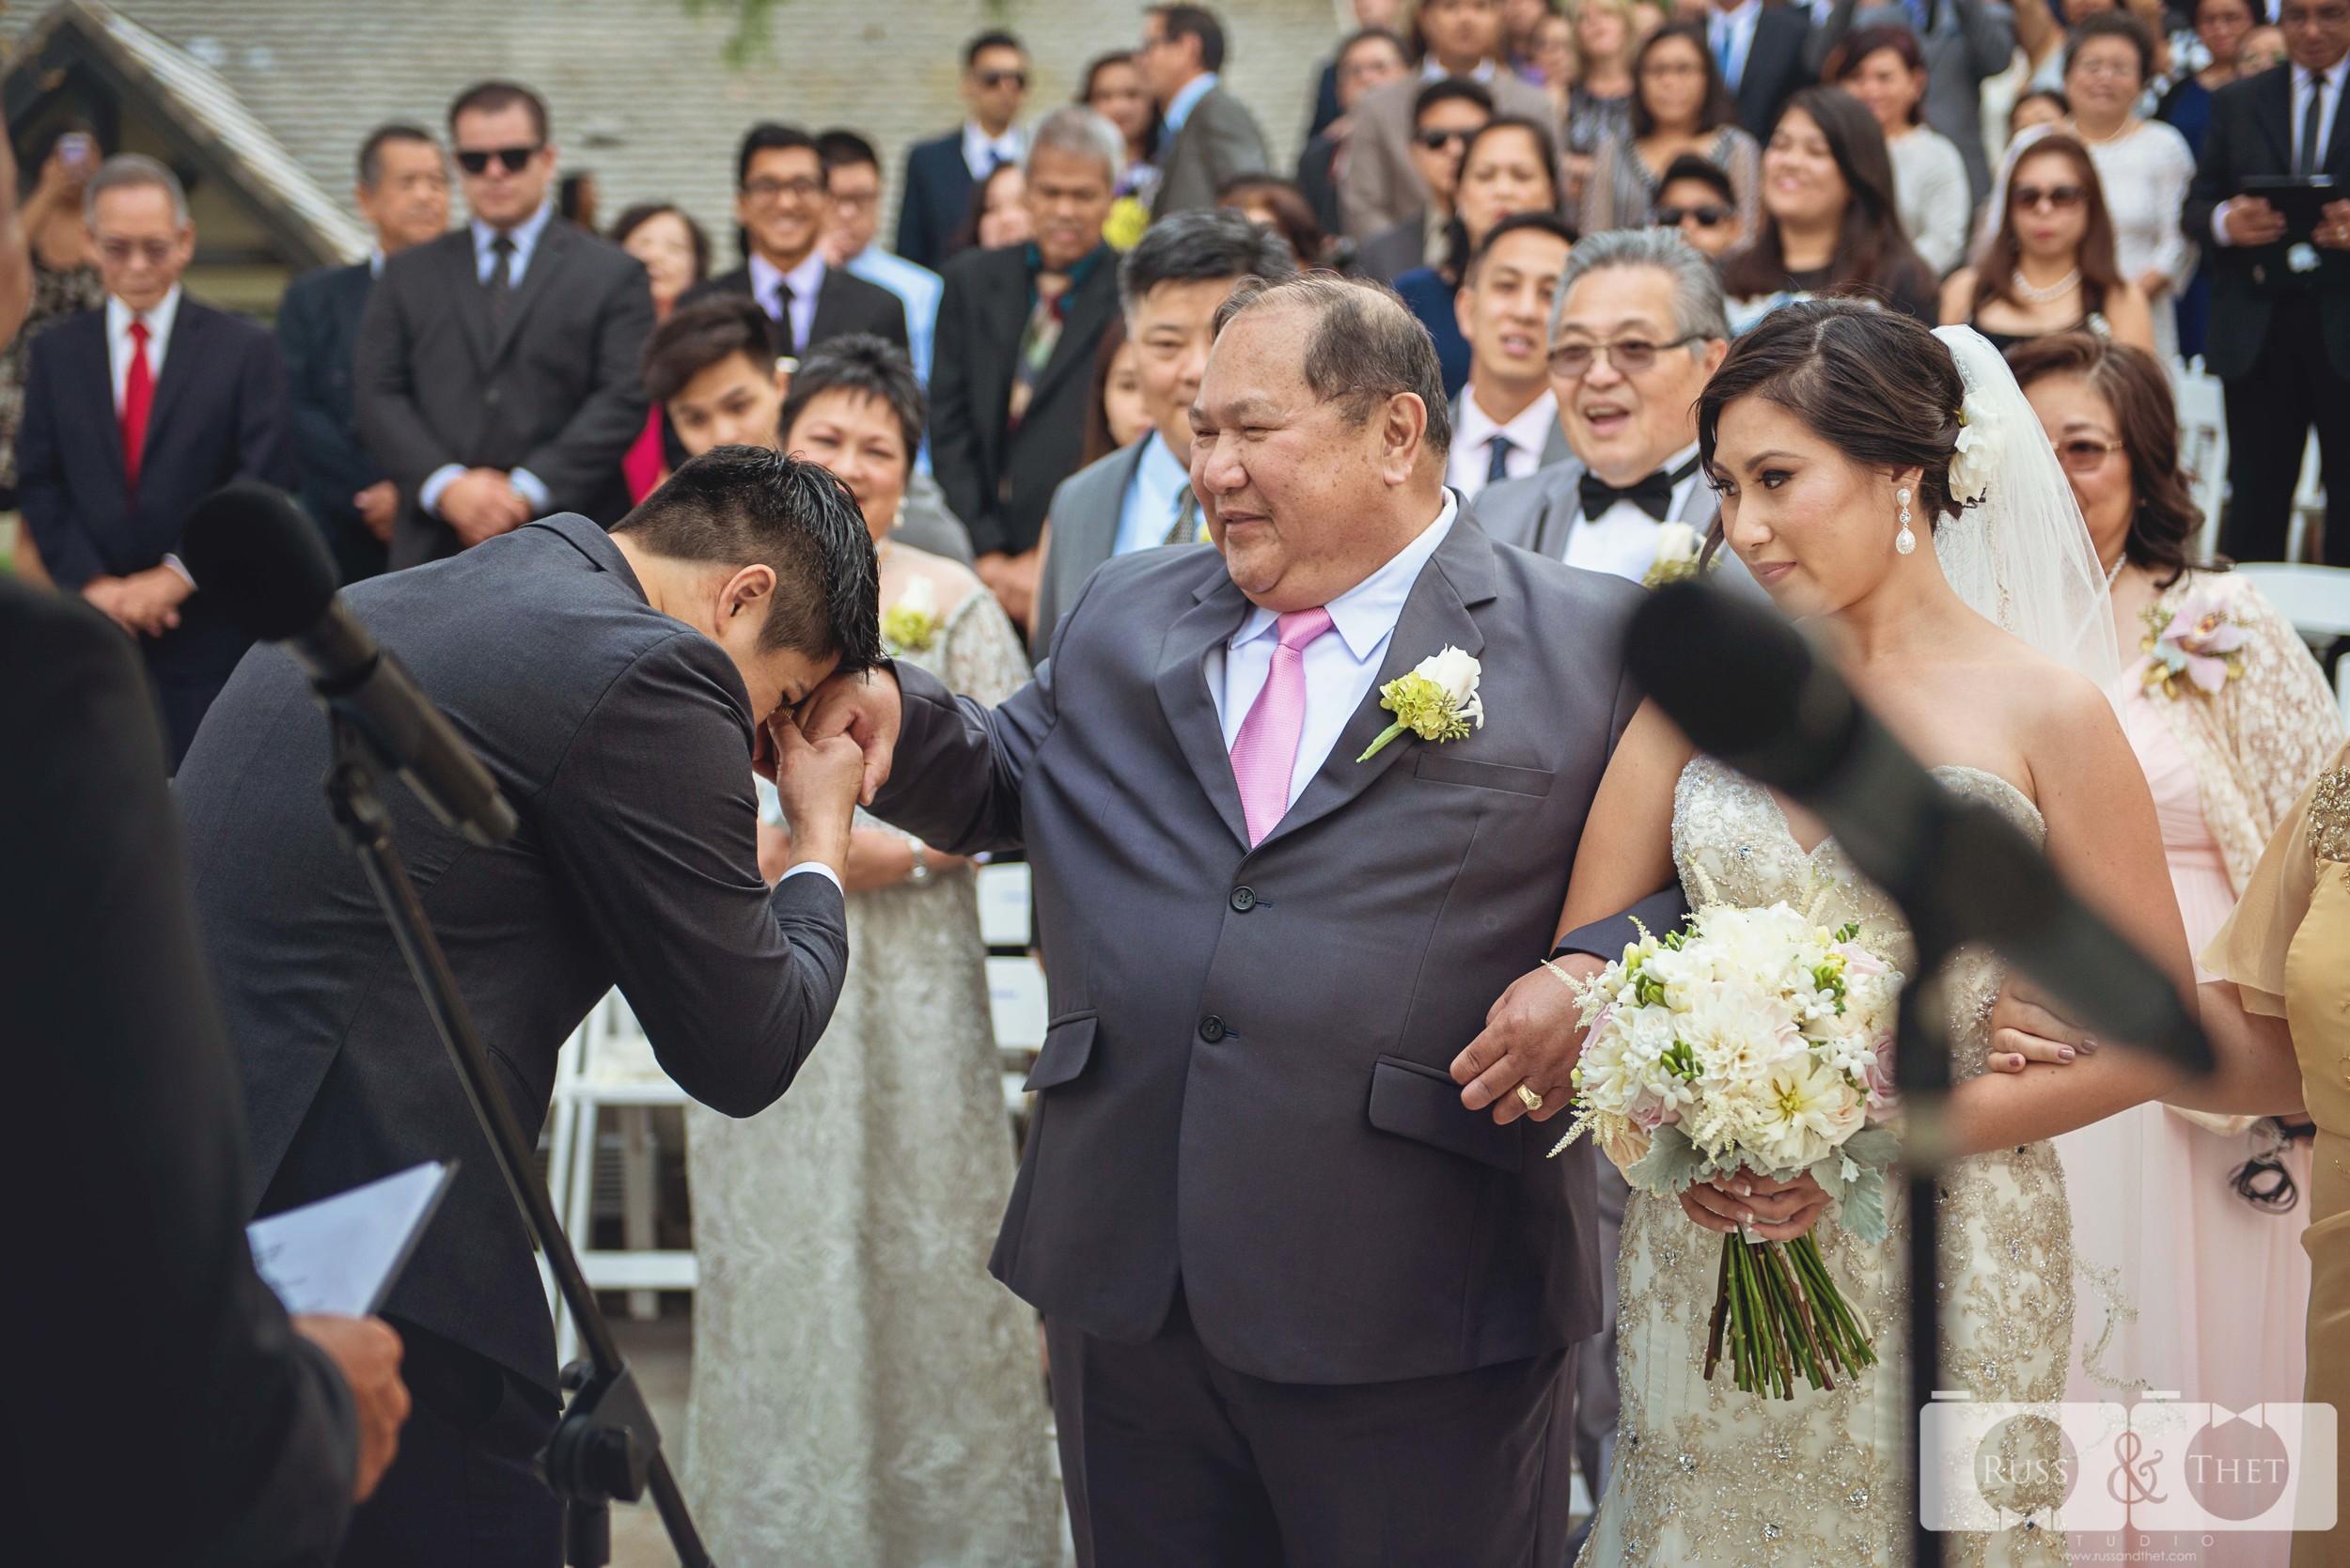 summit-house-fullerton-wedding-photographer-80.JPG